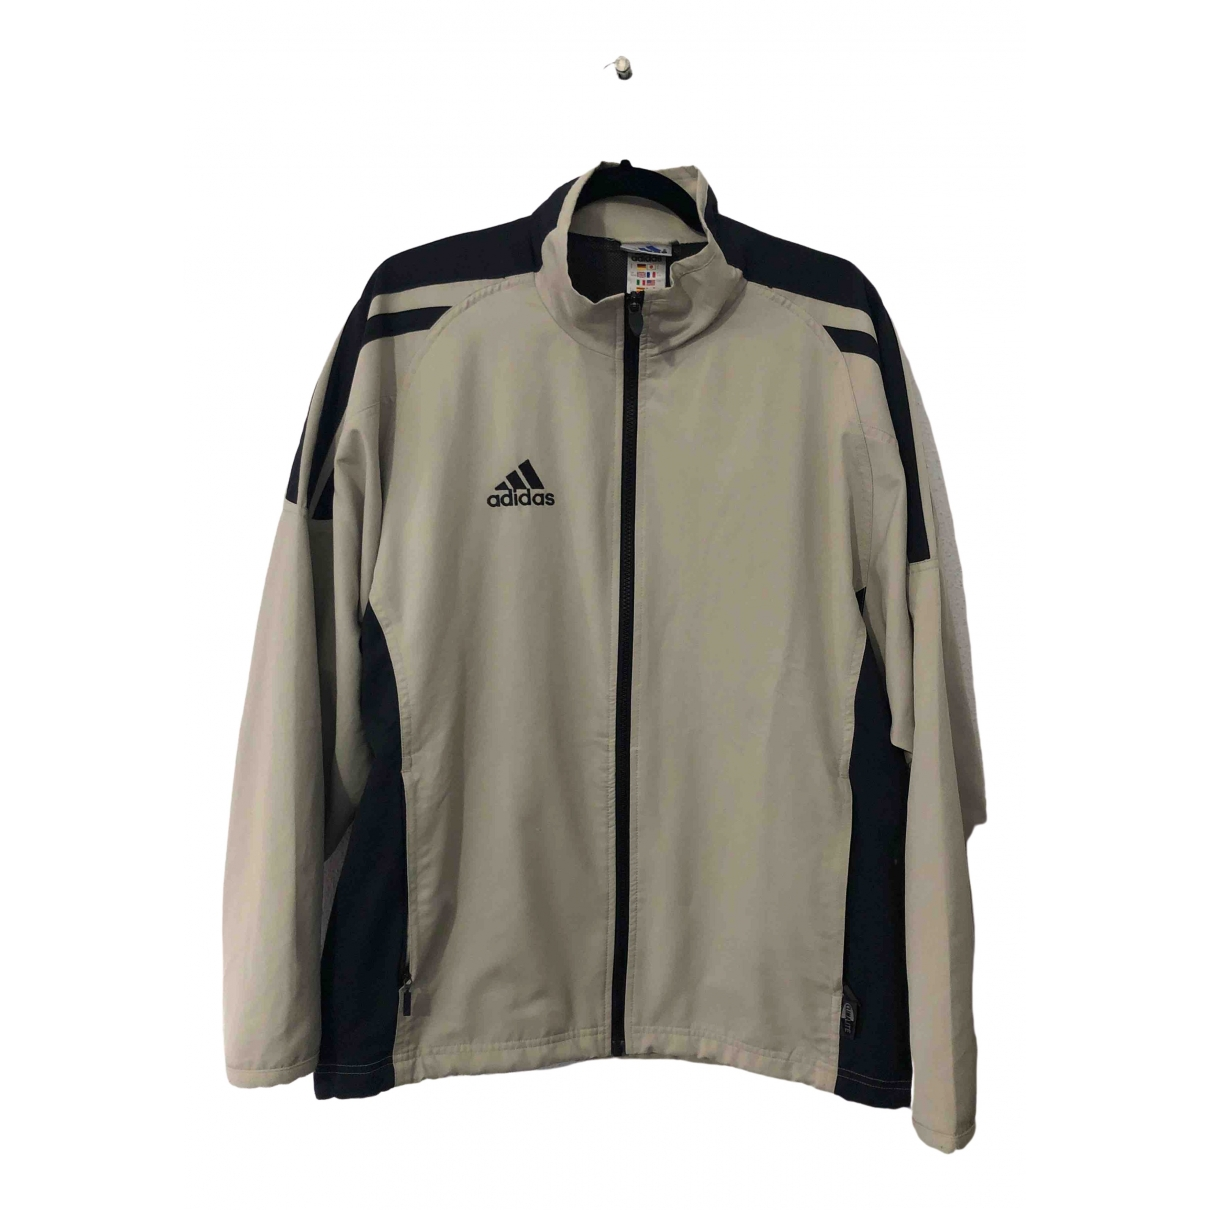 Adidas \N Beige Knitwear & Sweatshirts for Men L International